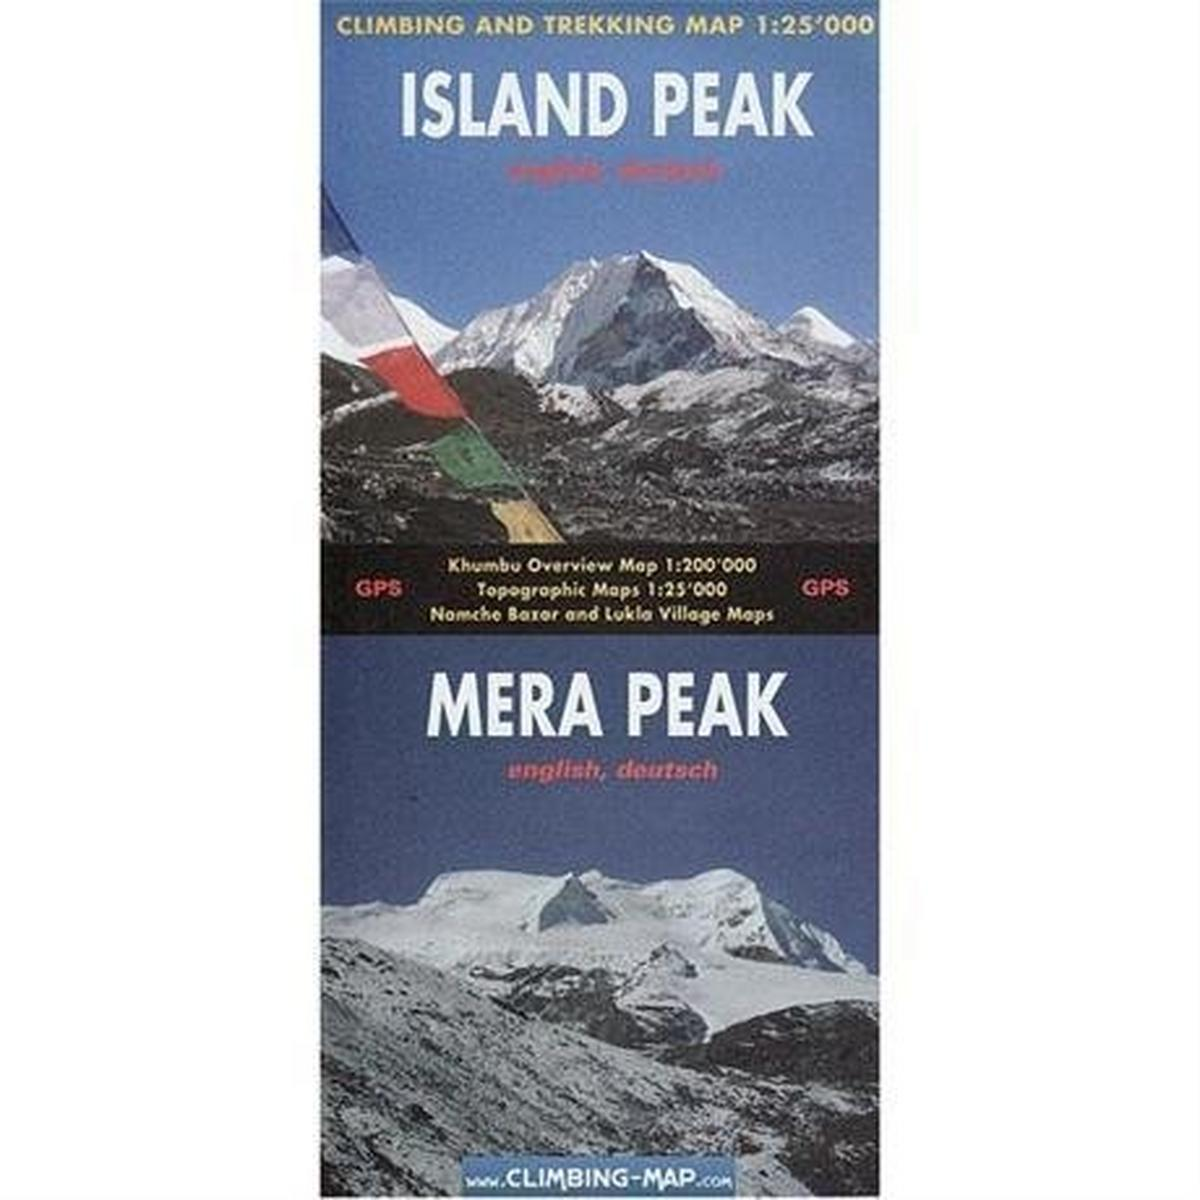 Miscellaneous Nepal Map: Island Peak / Mera Peak 1:25,000